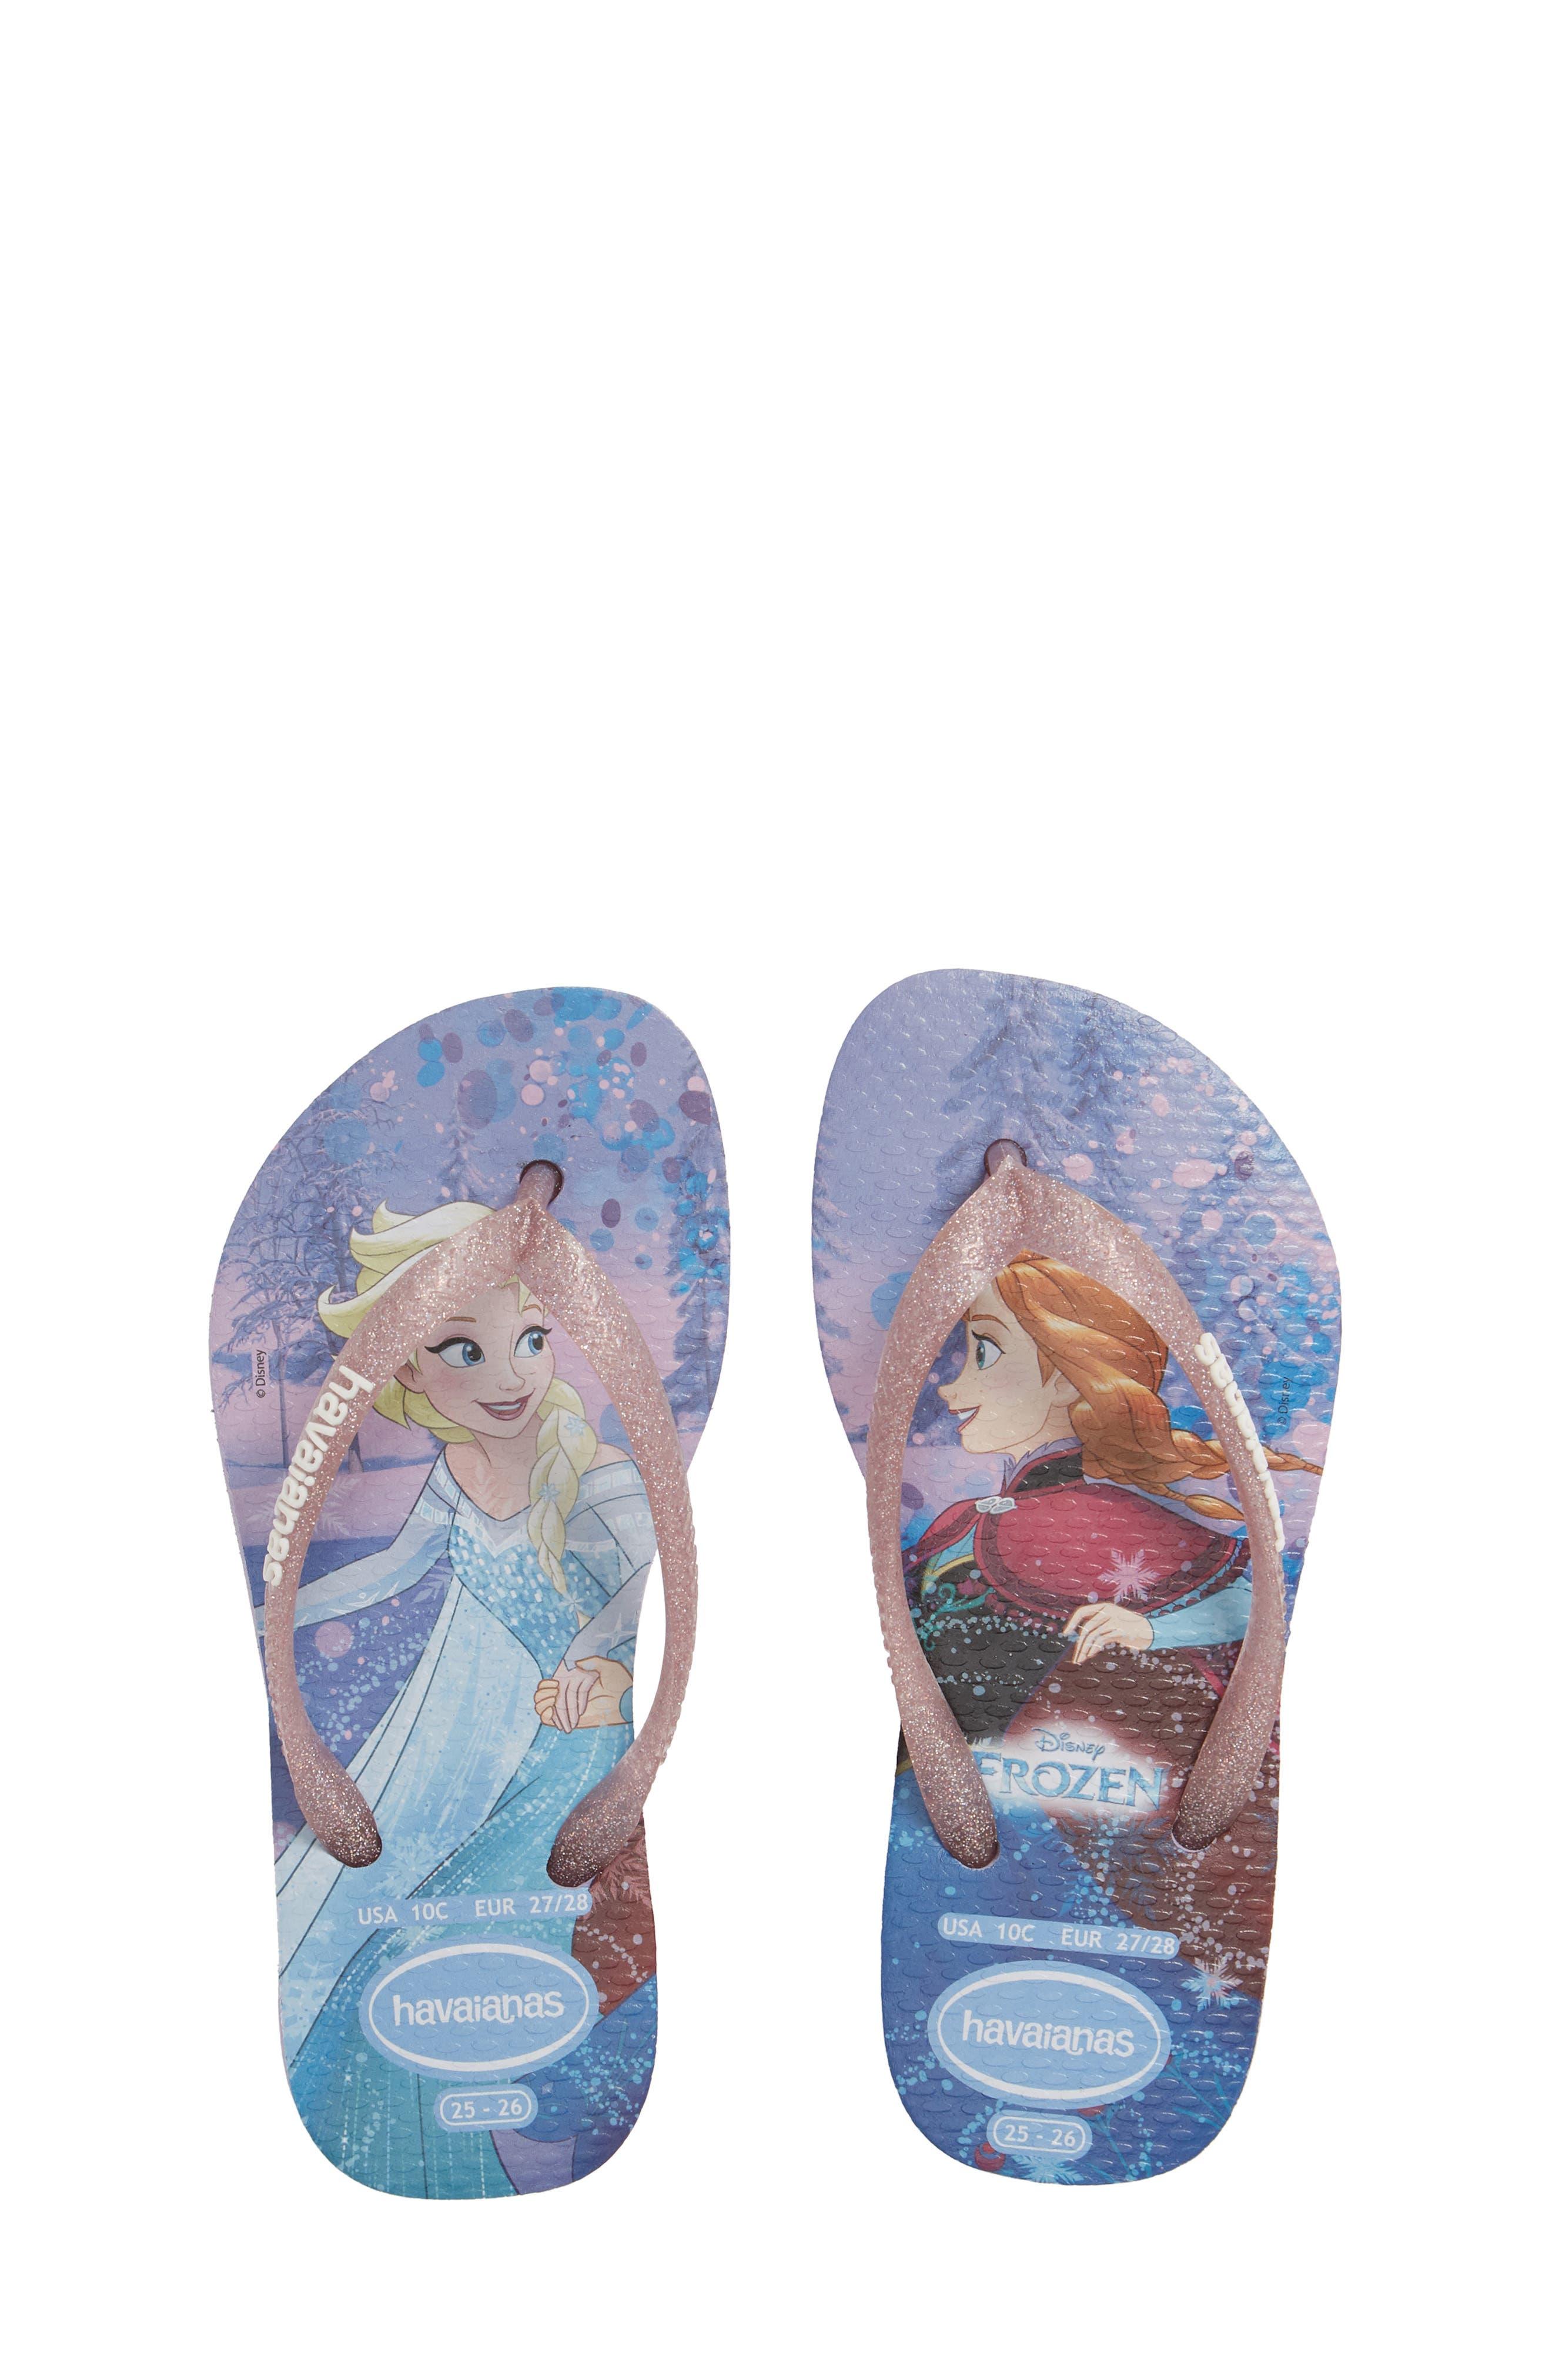 44e02d72190523 All Kids  Havaianas   Baby Sandals   Flip-Flops